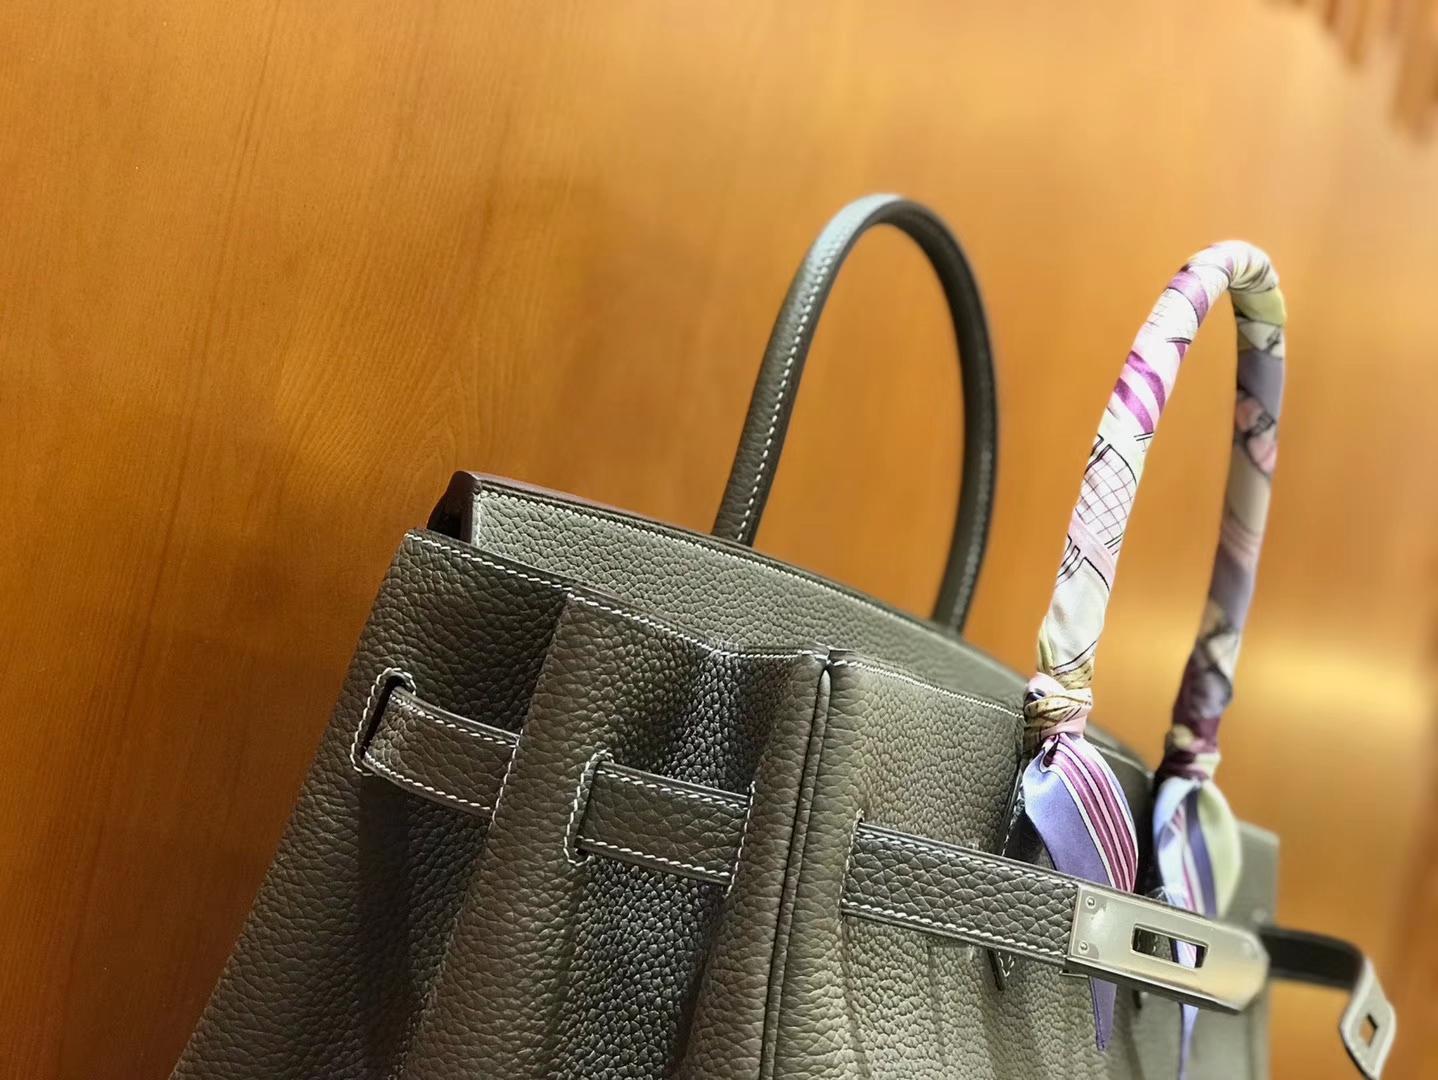 Hermès(爱马仕)Birkin 铂金包 斑鸠灰 小牛皮 银扣 40cm 男士首选